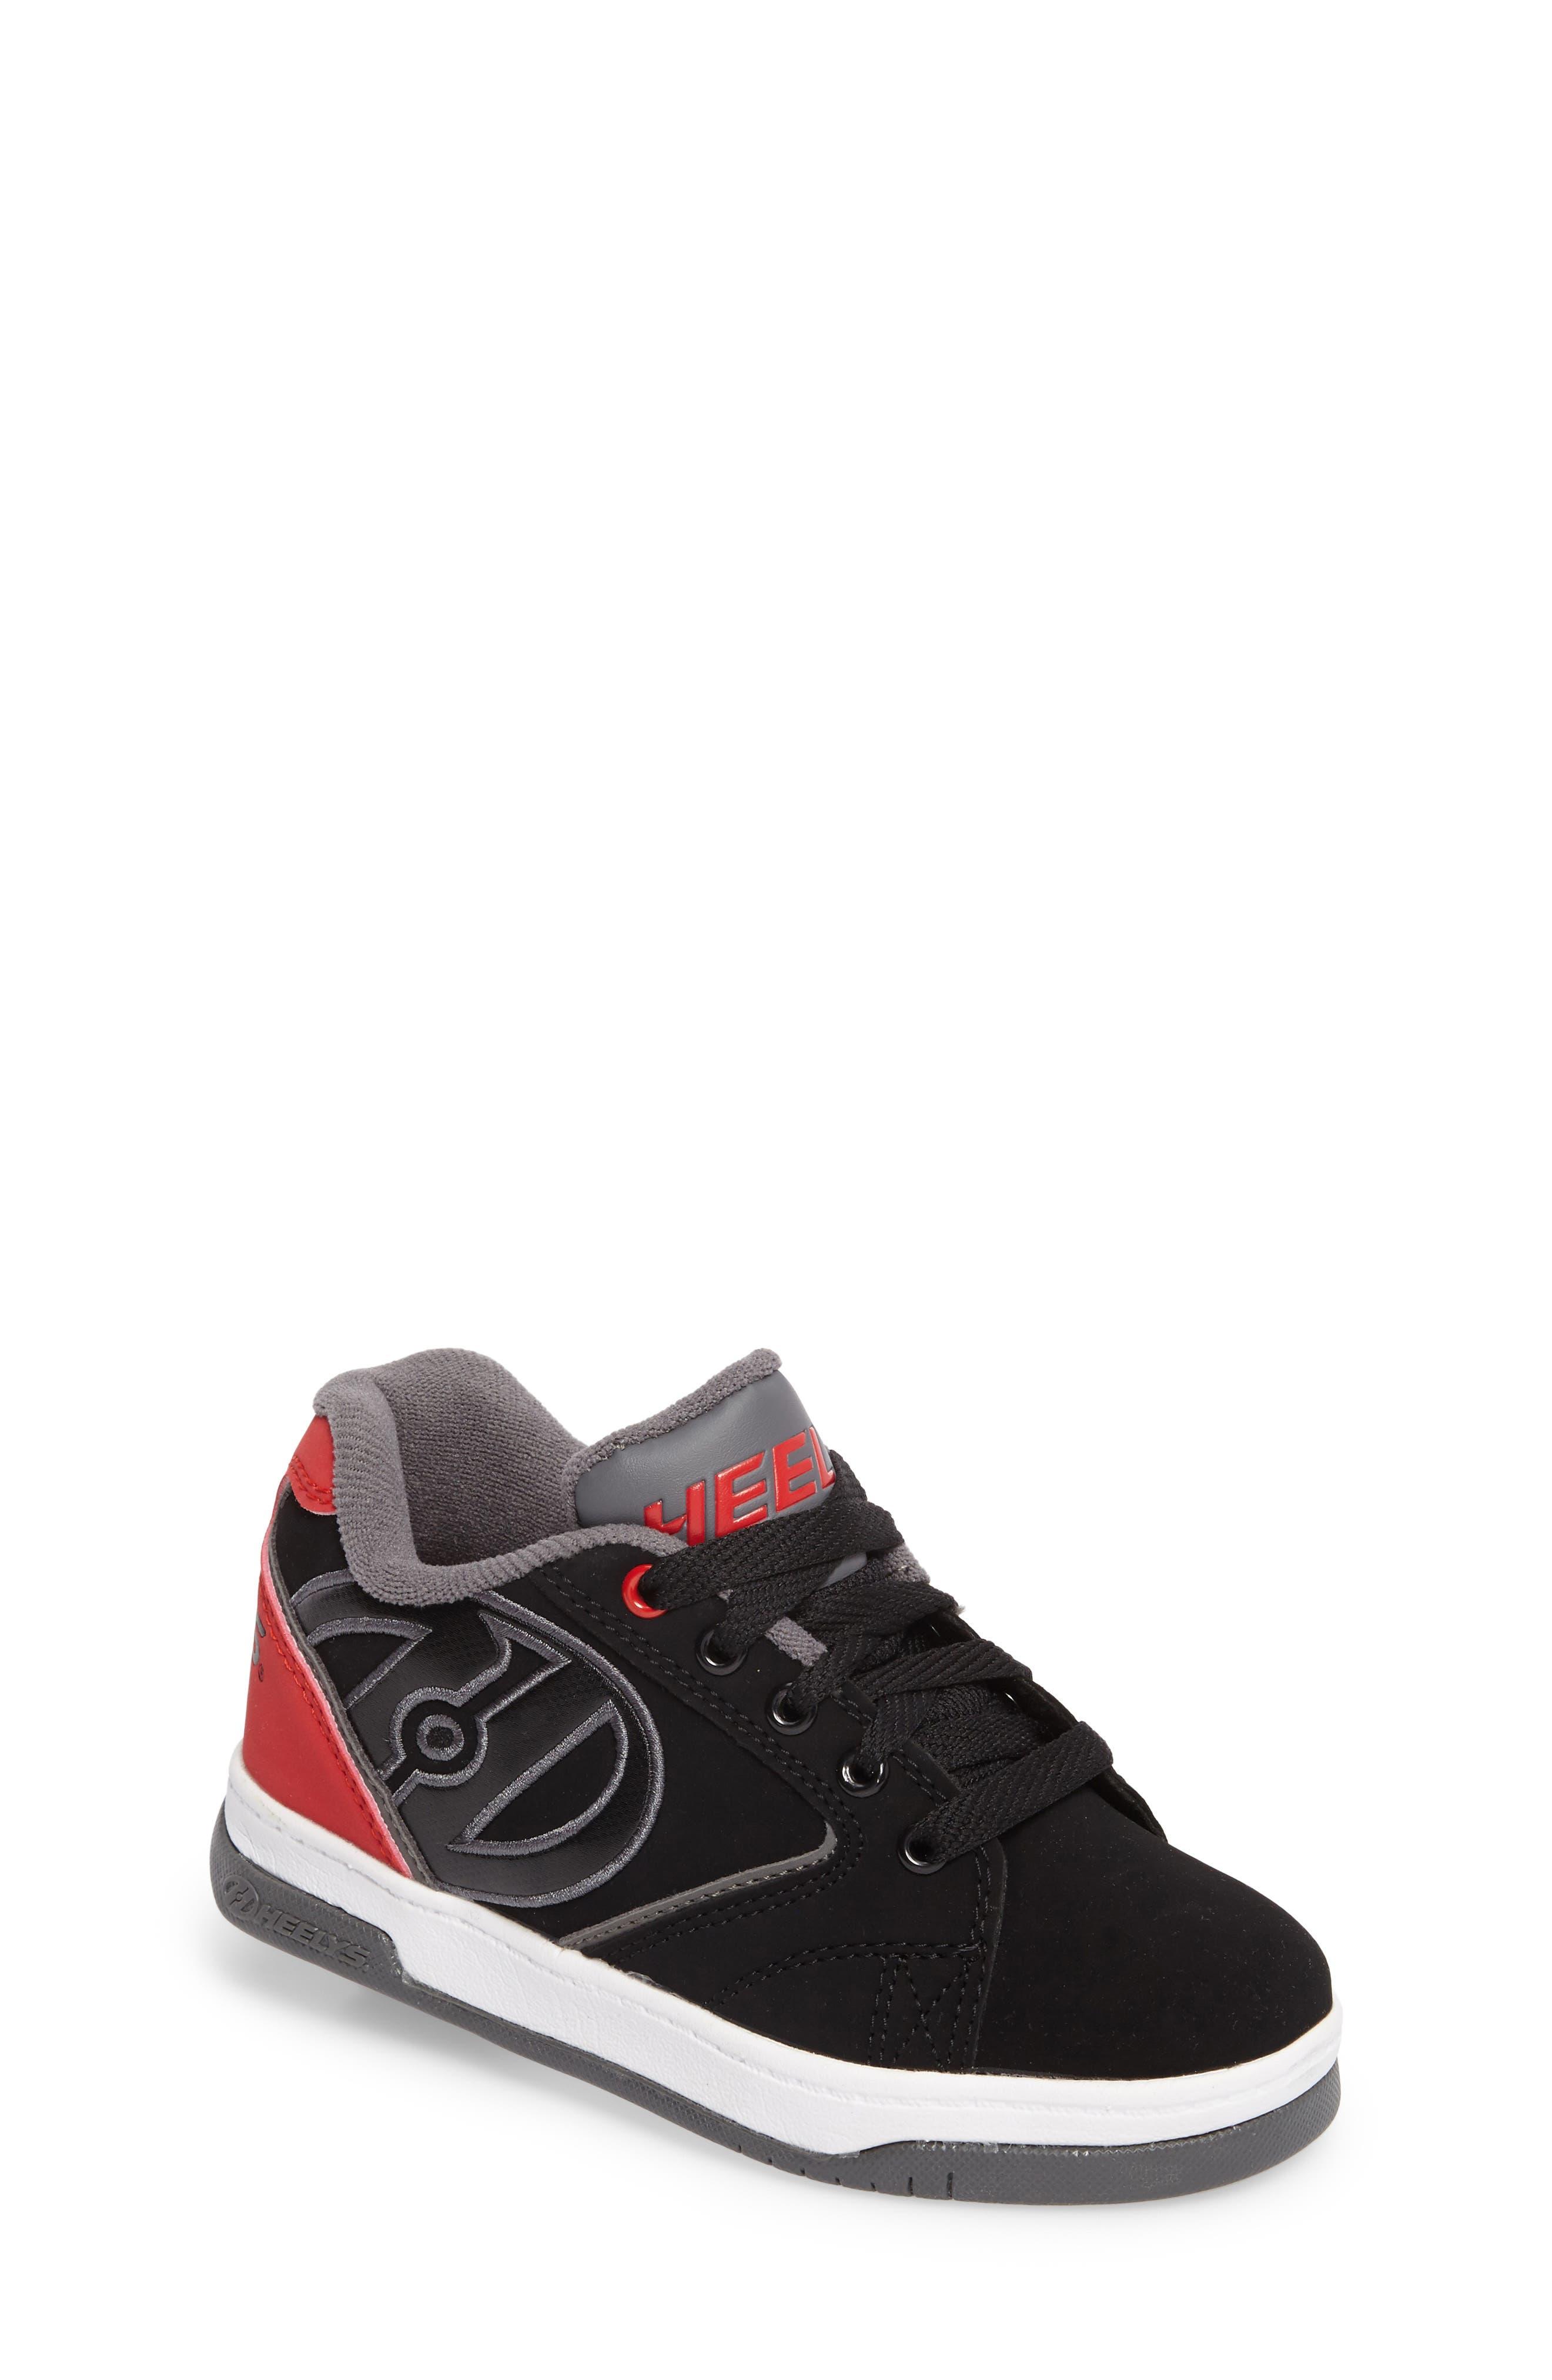 Heeleys'Propel 2.0' Sneaker,                             Main thumbnail 1, color,                             Black/ Red/ Grey